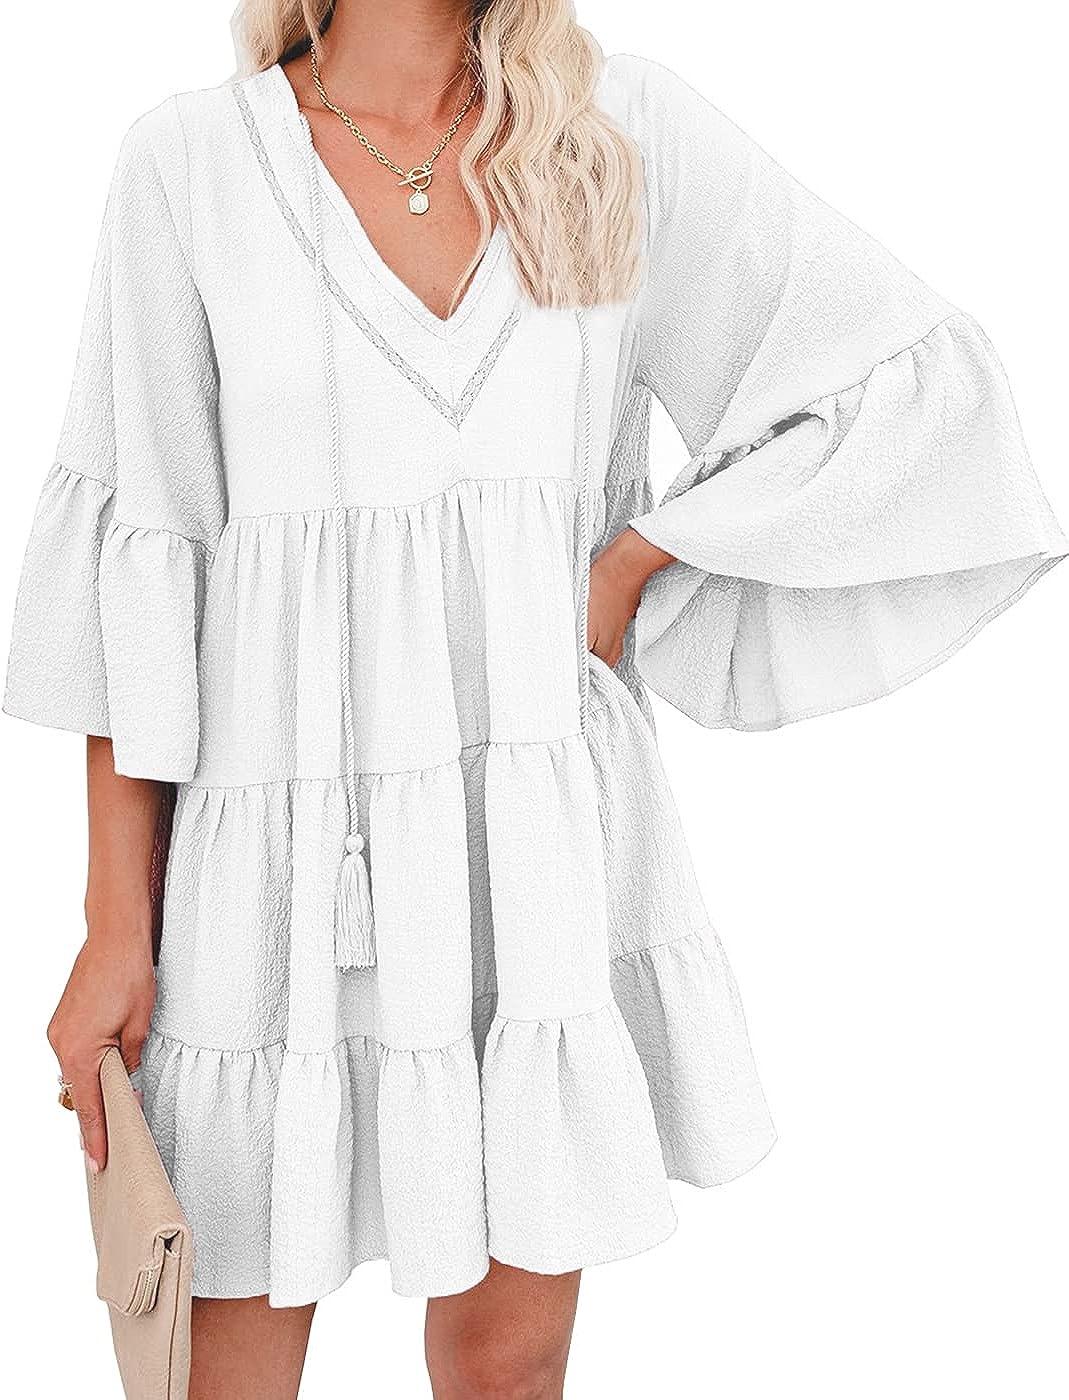 JSVZREU Womens Babydoll Dress Tiered Summer Casual Ruffle Bell Sleeve V Neck Dress Swing Flowy